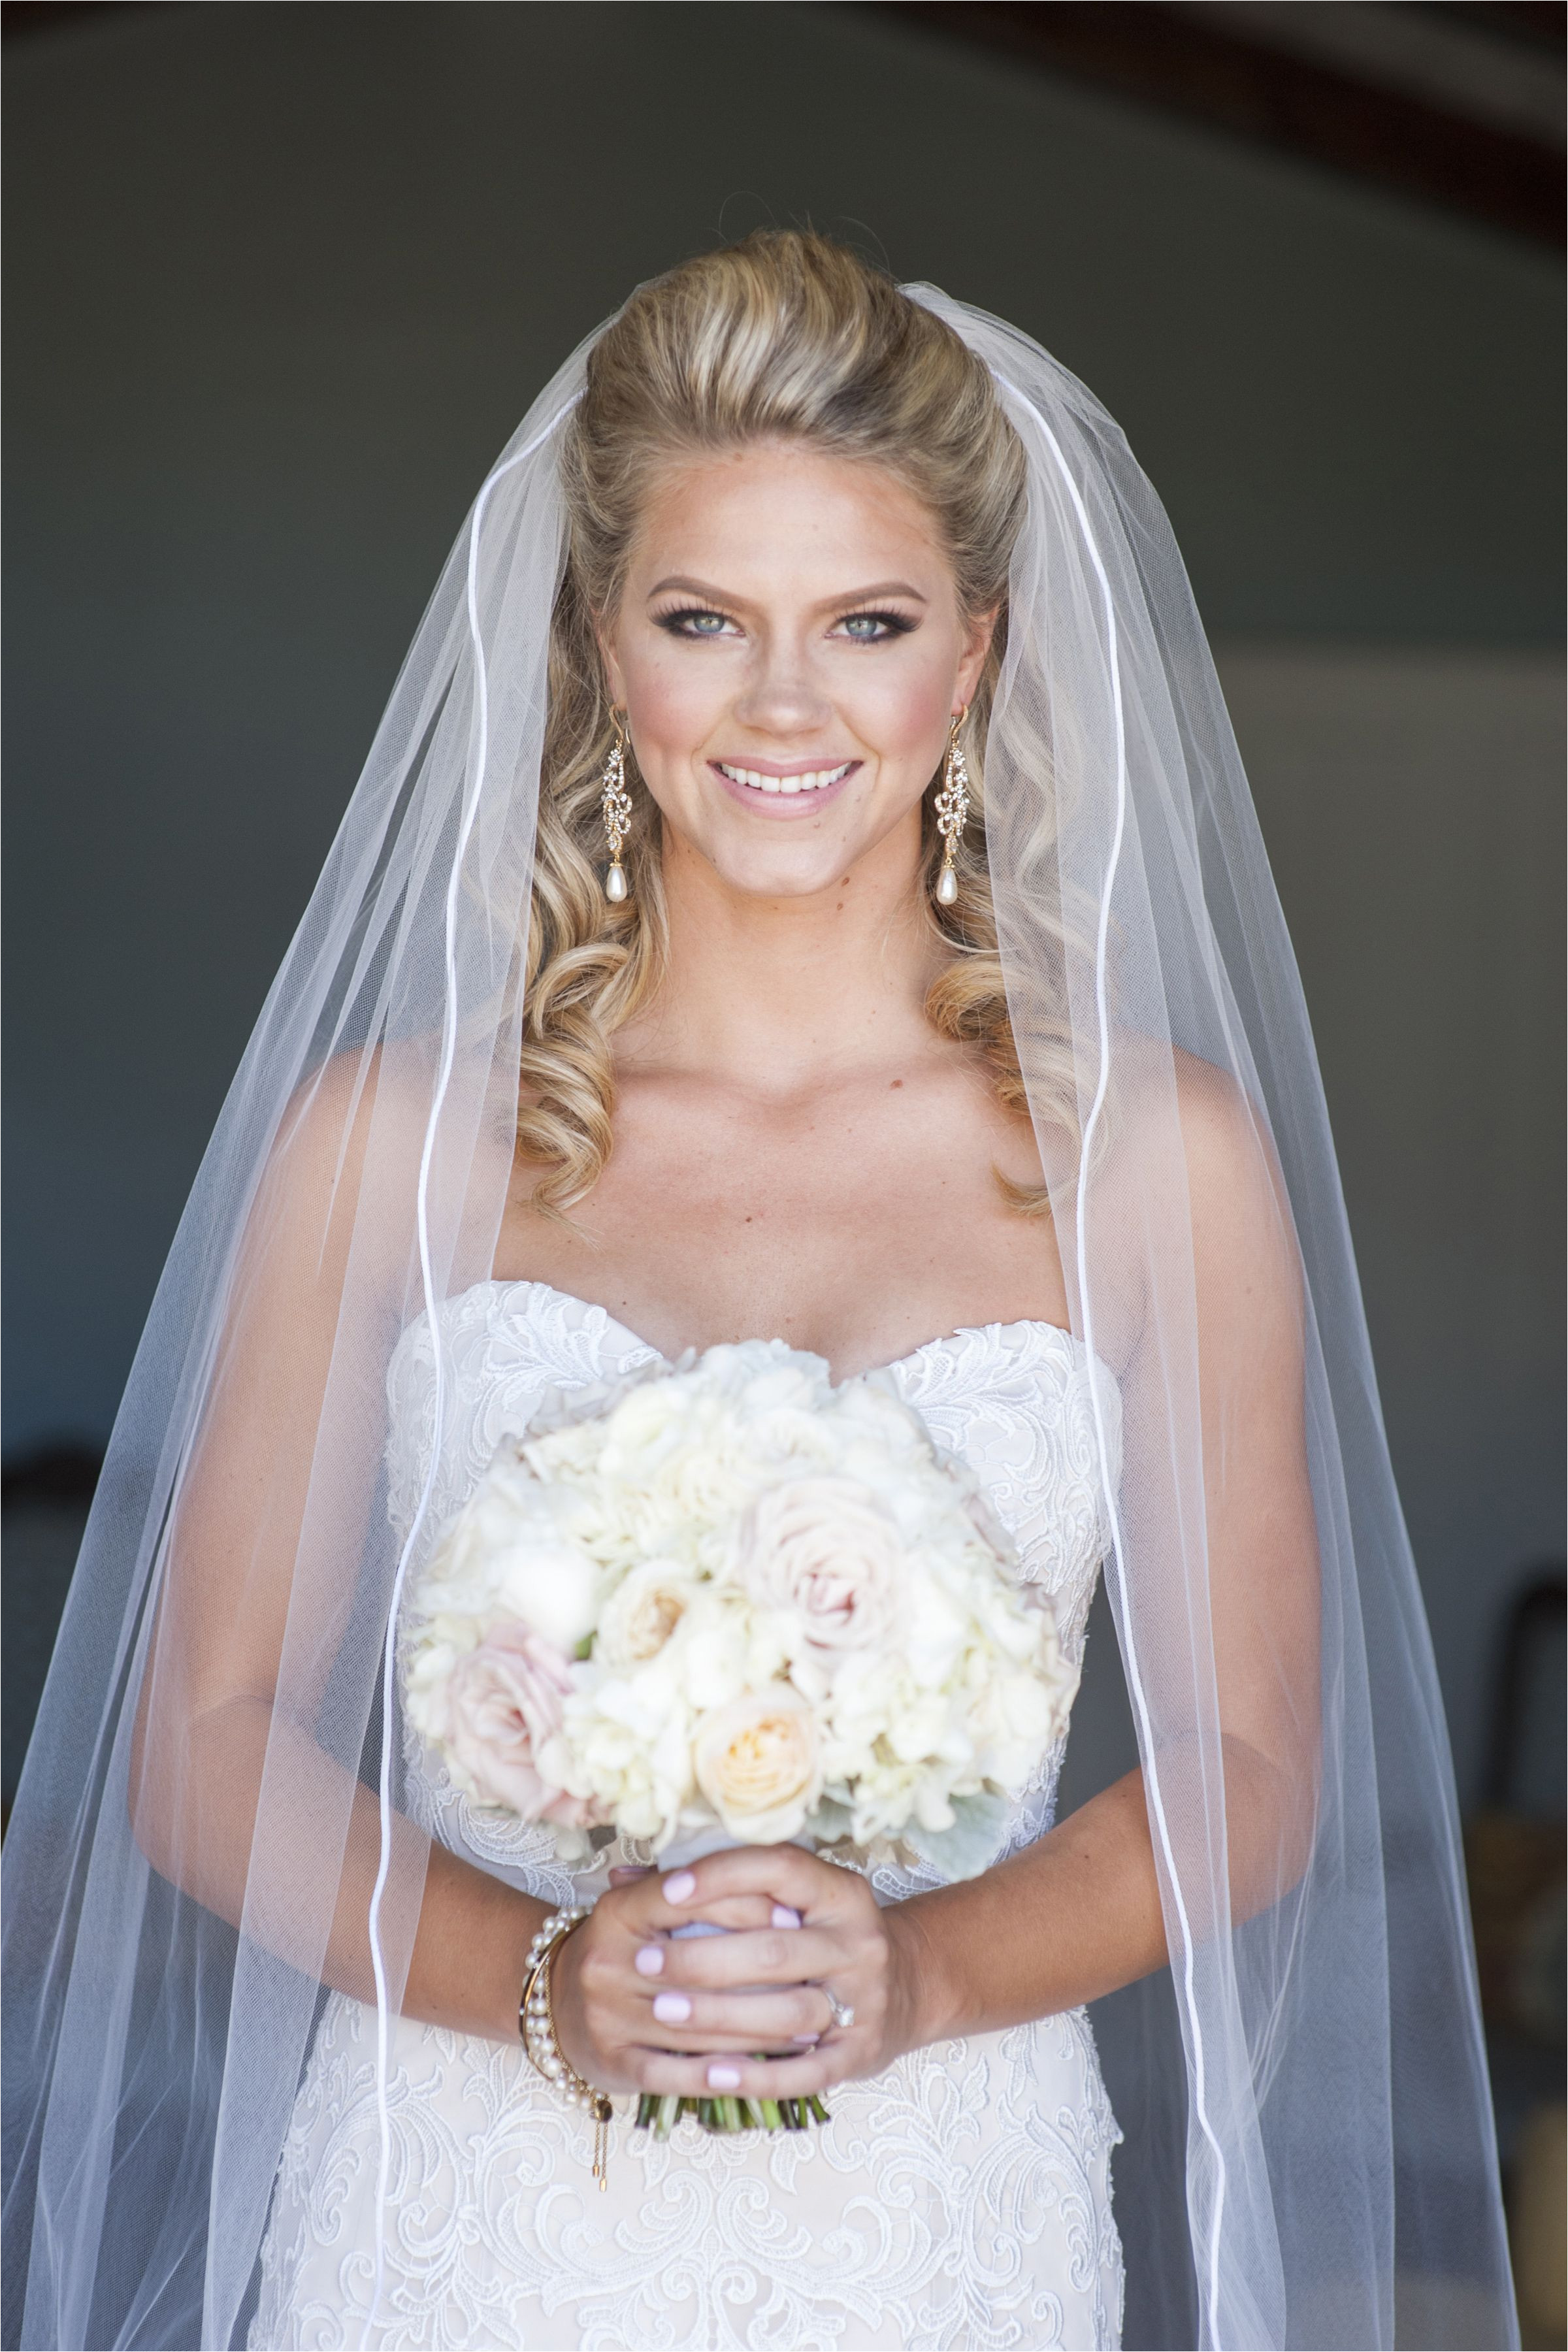 bride dress wedding down bouquet silhouette cathedral veil make up hair half up half down